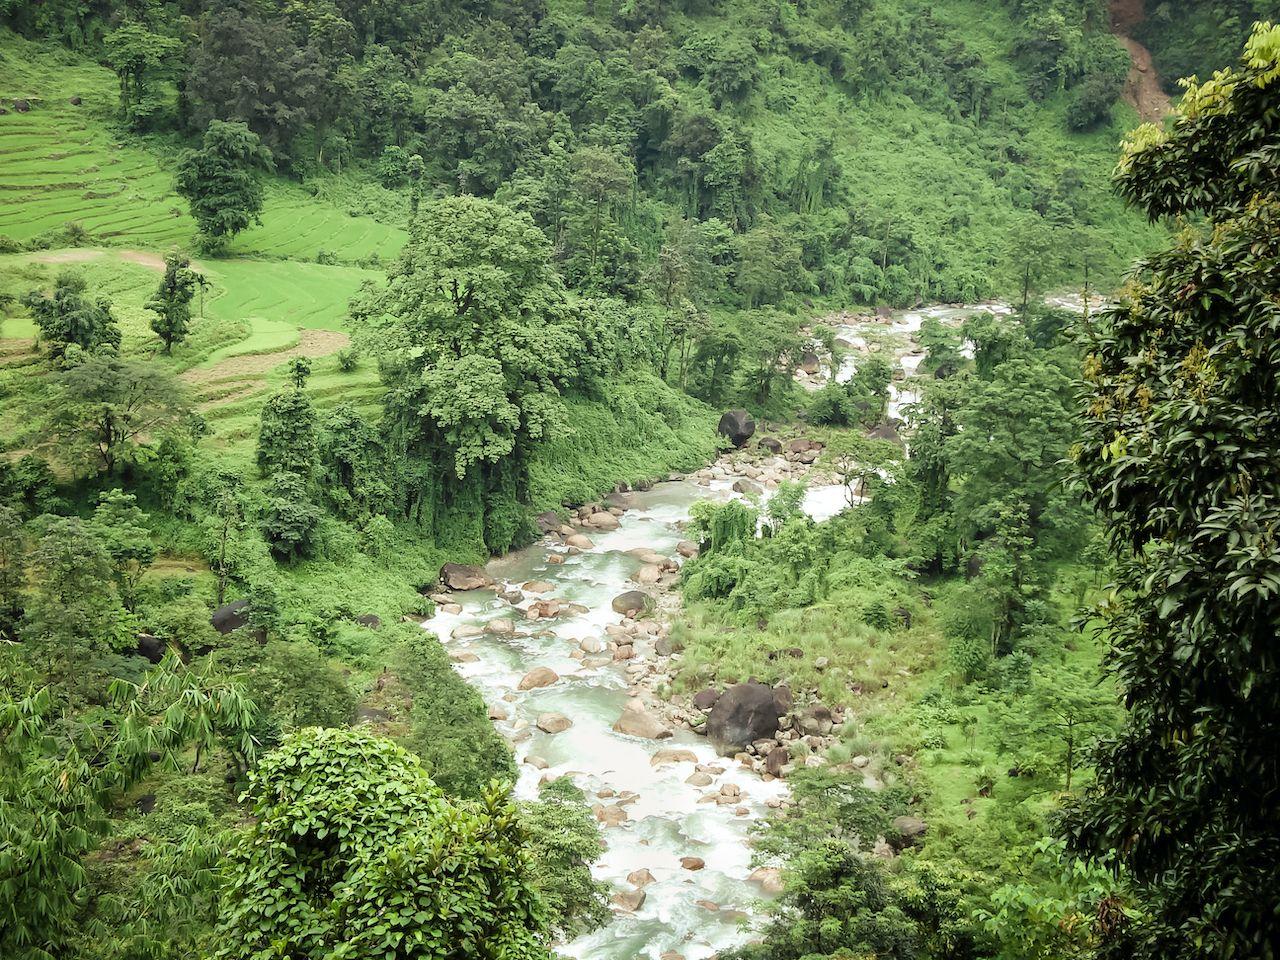 Main tributary of river Teesta